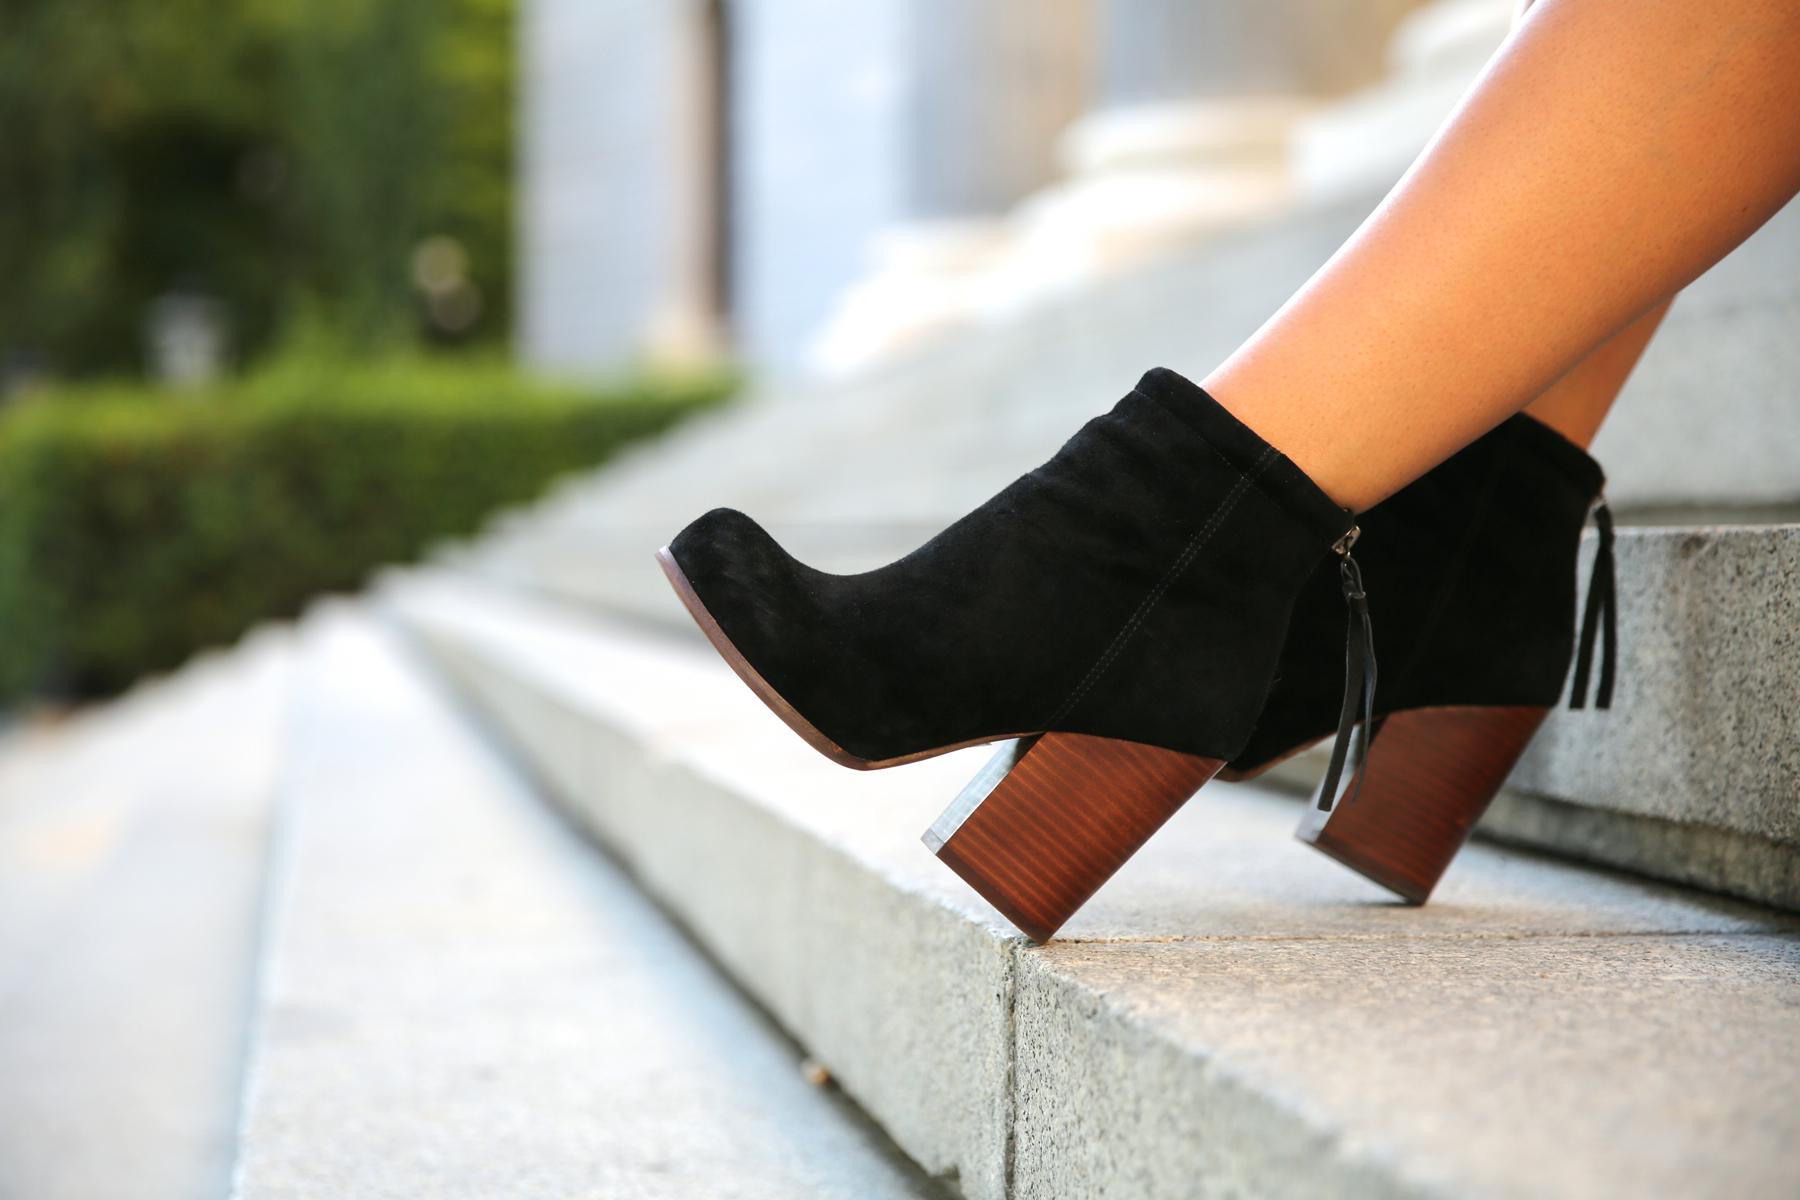 trendy_taste-look-outfit-street_style-ootd-blog-blogger-fashion_spain-moda_españa-animal_print-boho-casual-falda-skirt-black_booties-botines_negros-jeffrey_campbell-zara-bolso_flecos-vintage-7